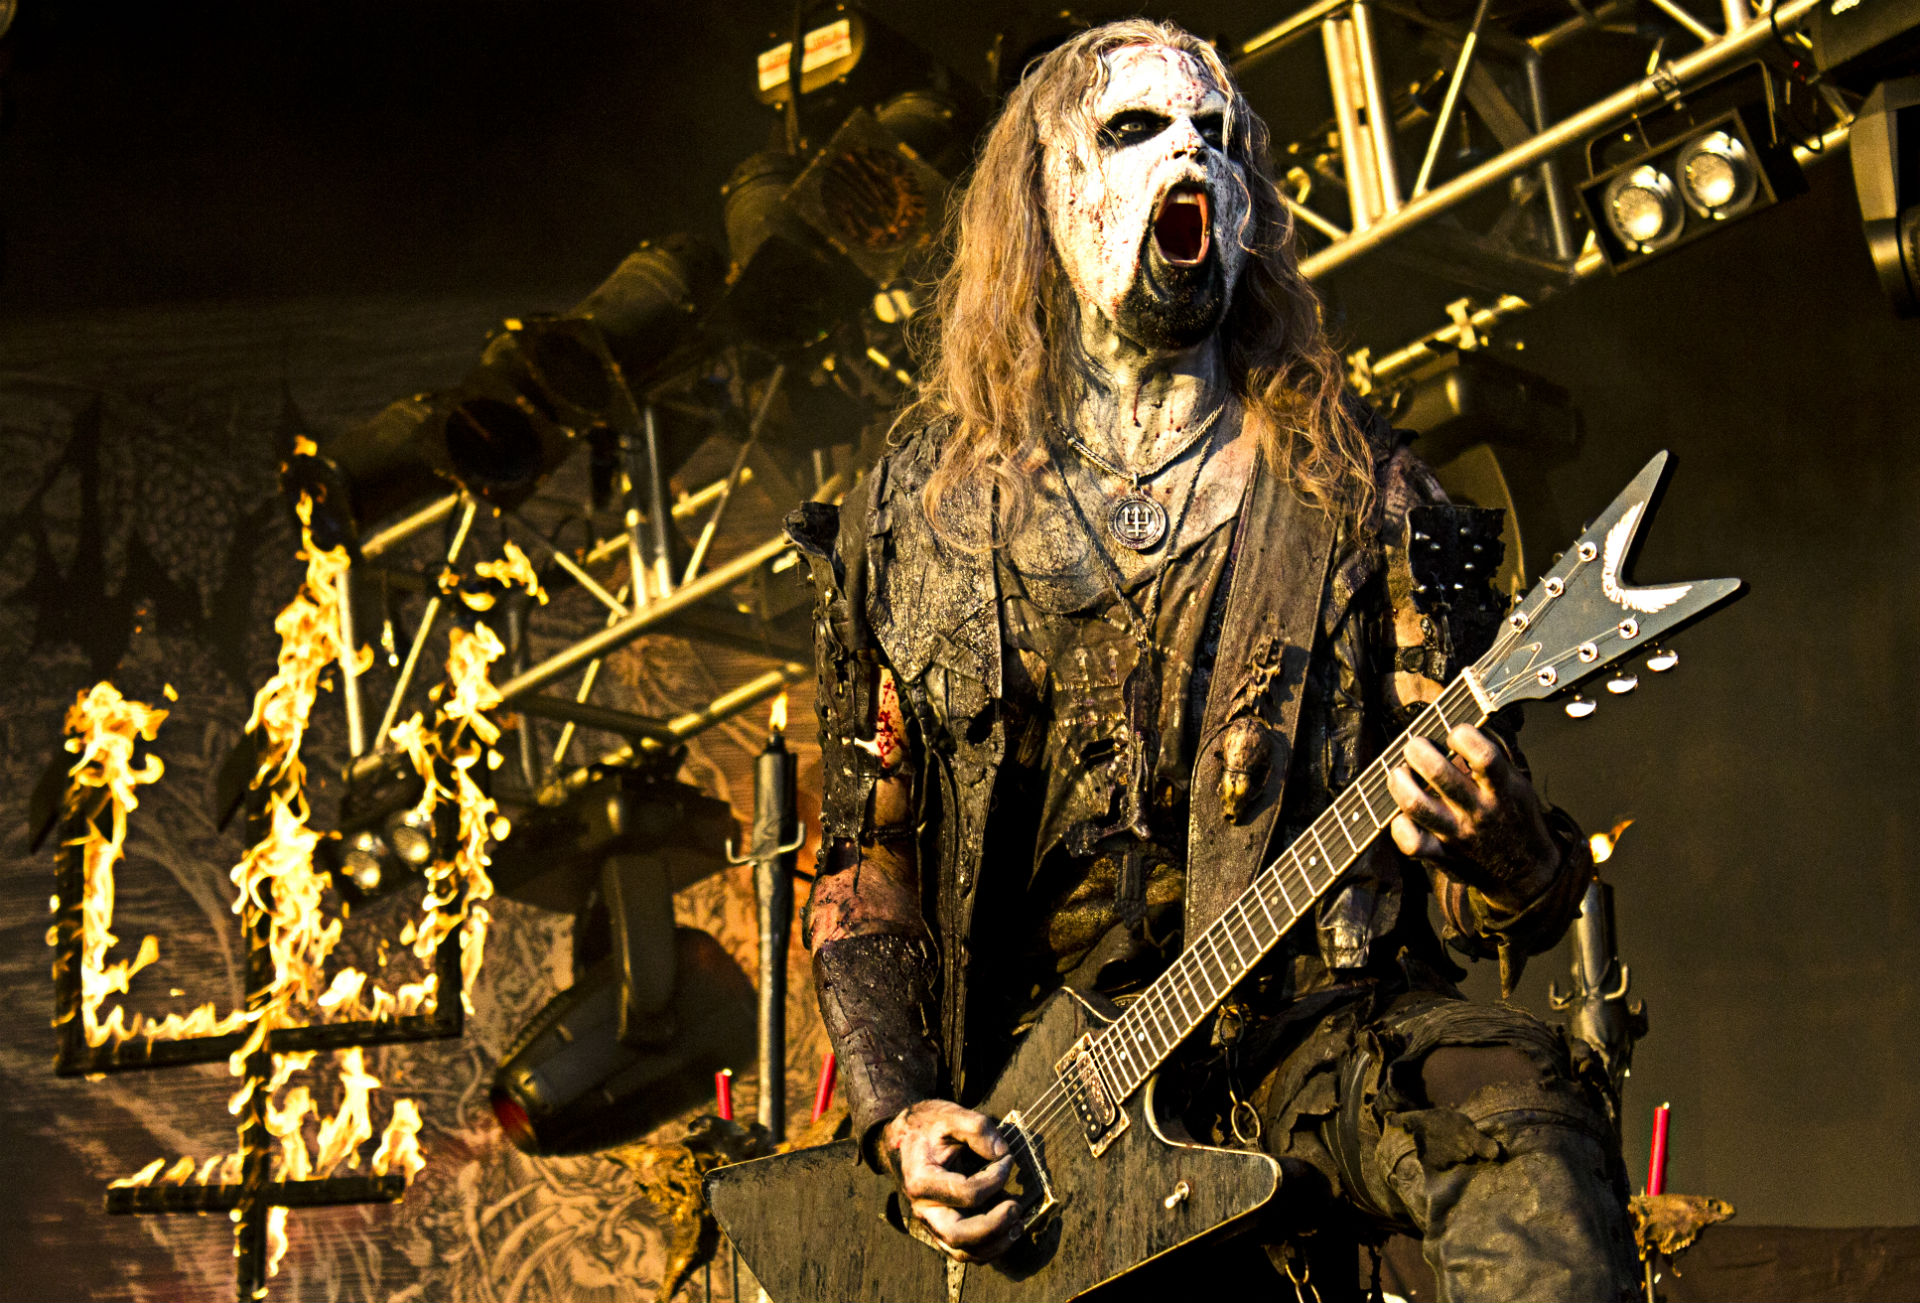 heavy metal rock wallpaper,performance,musician,entertainment,guitarist,performing arts